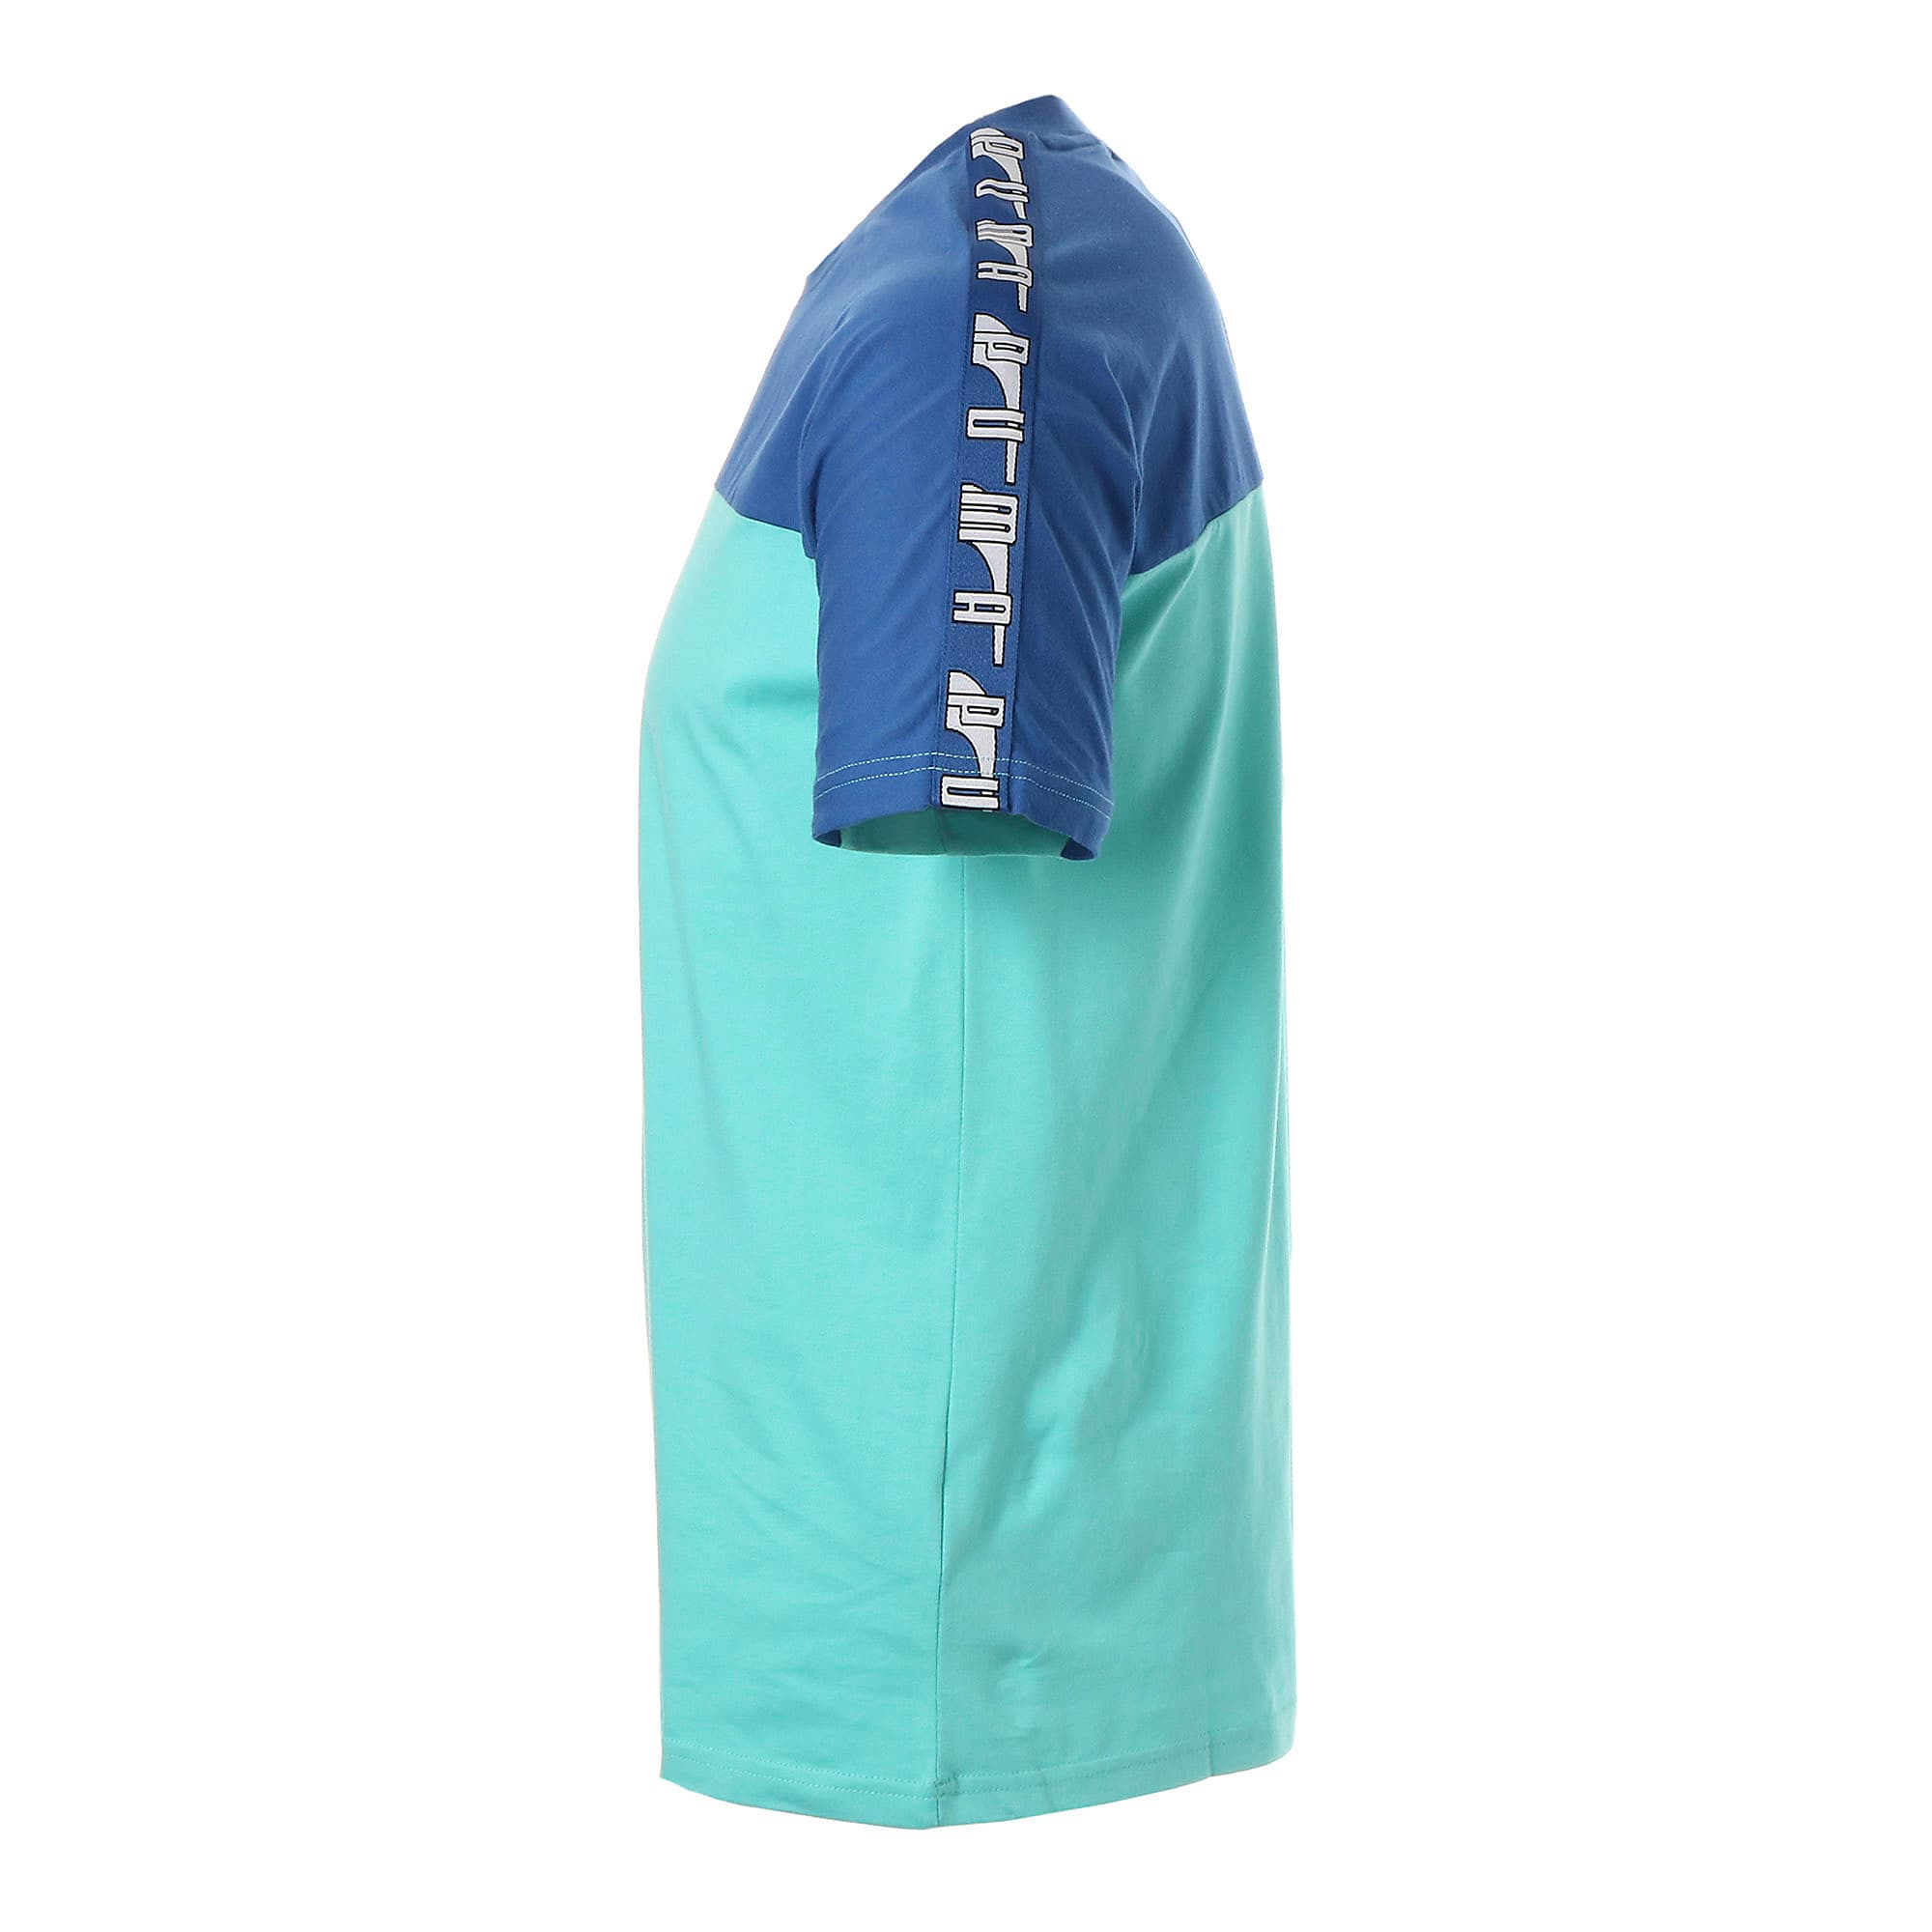 Thumbnail 5 of PUMA XTG SS Tシャツ 半袖, Blue Turquoise, medium-JPN